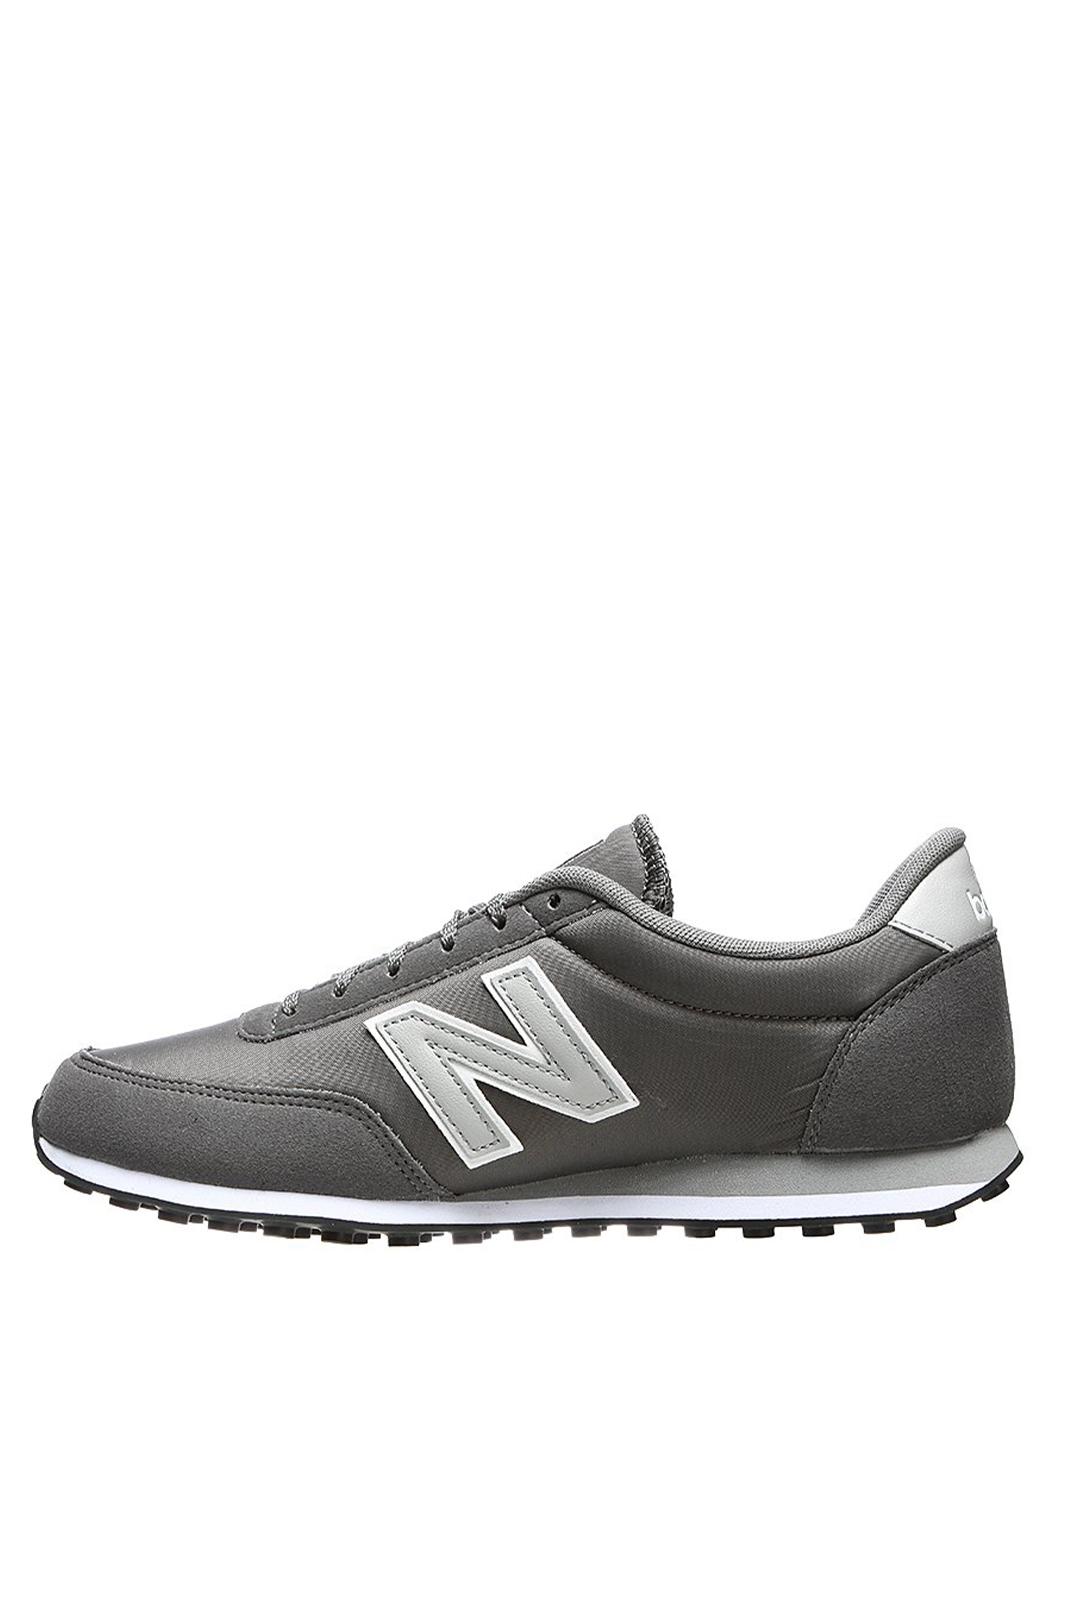 Chaussures   New balance U410CA CA